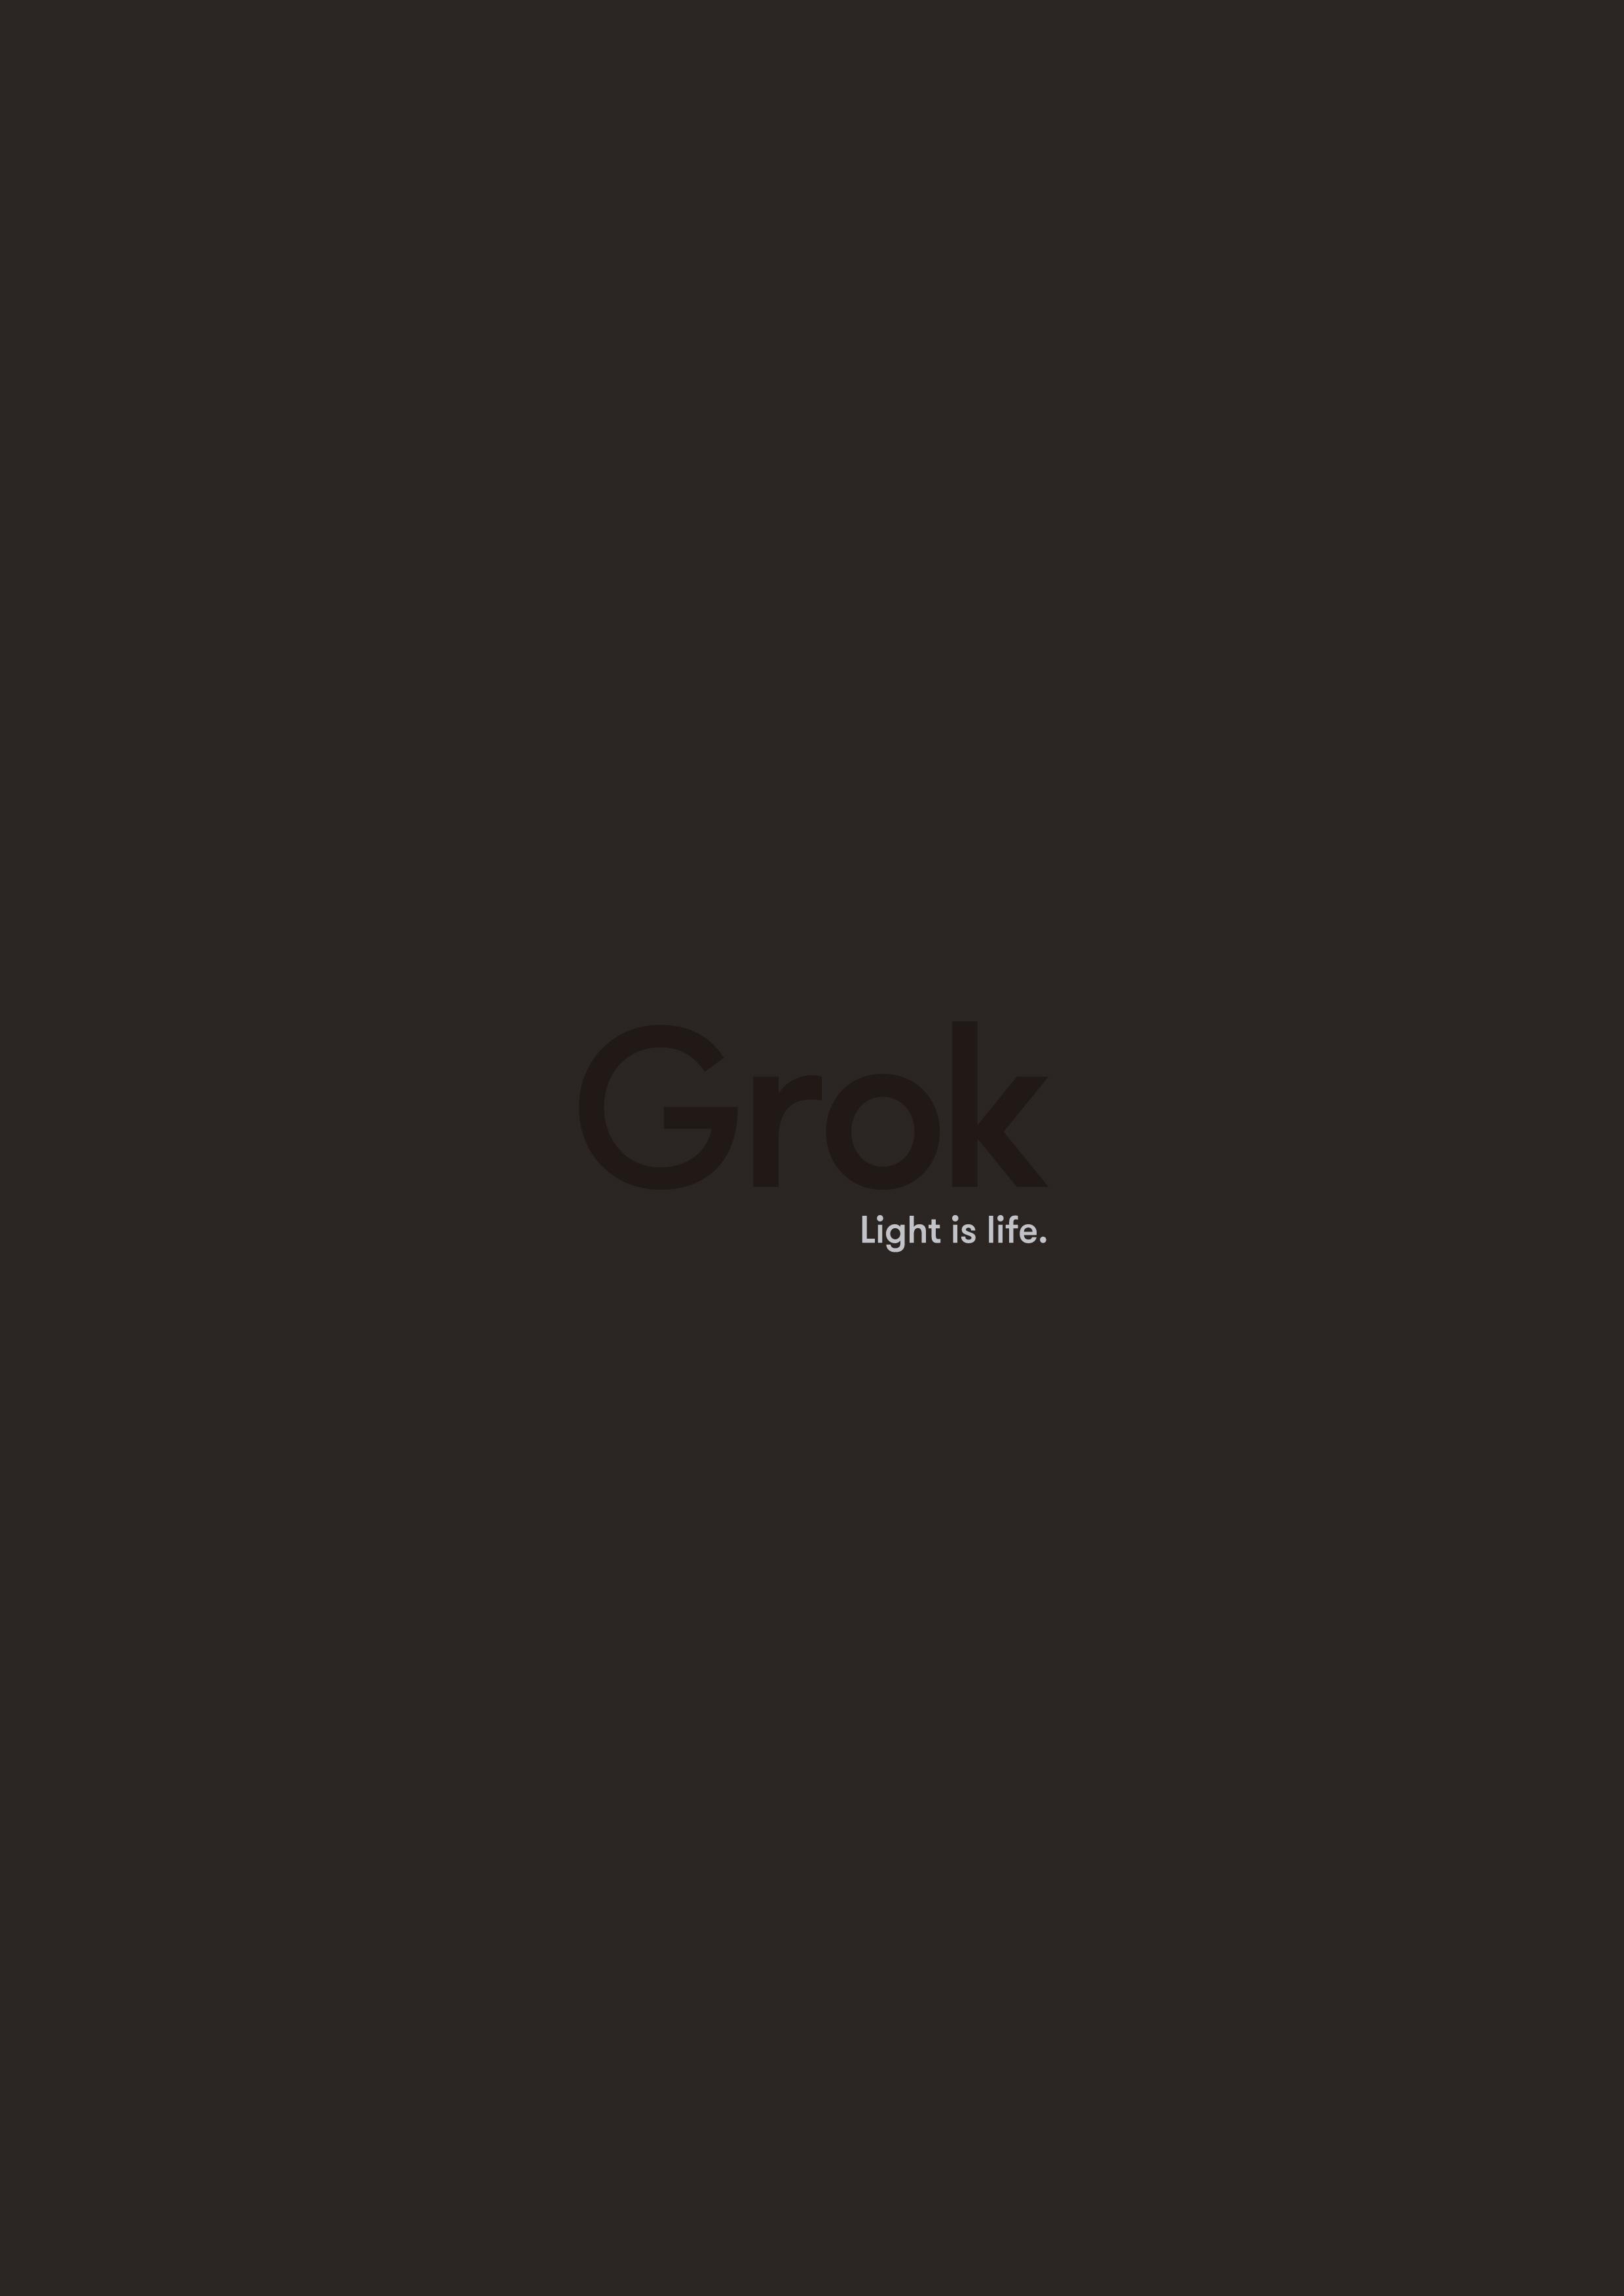 Leds C4_GROK